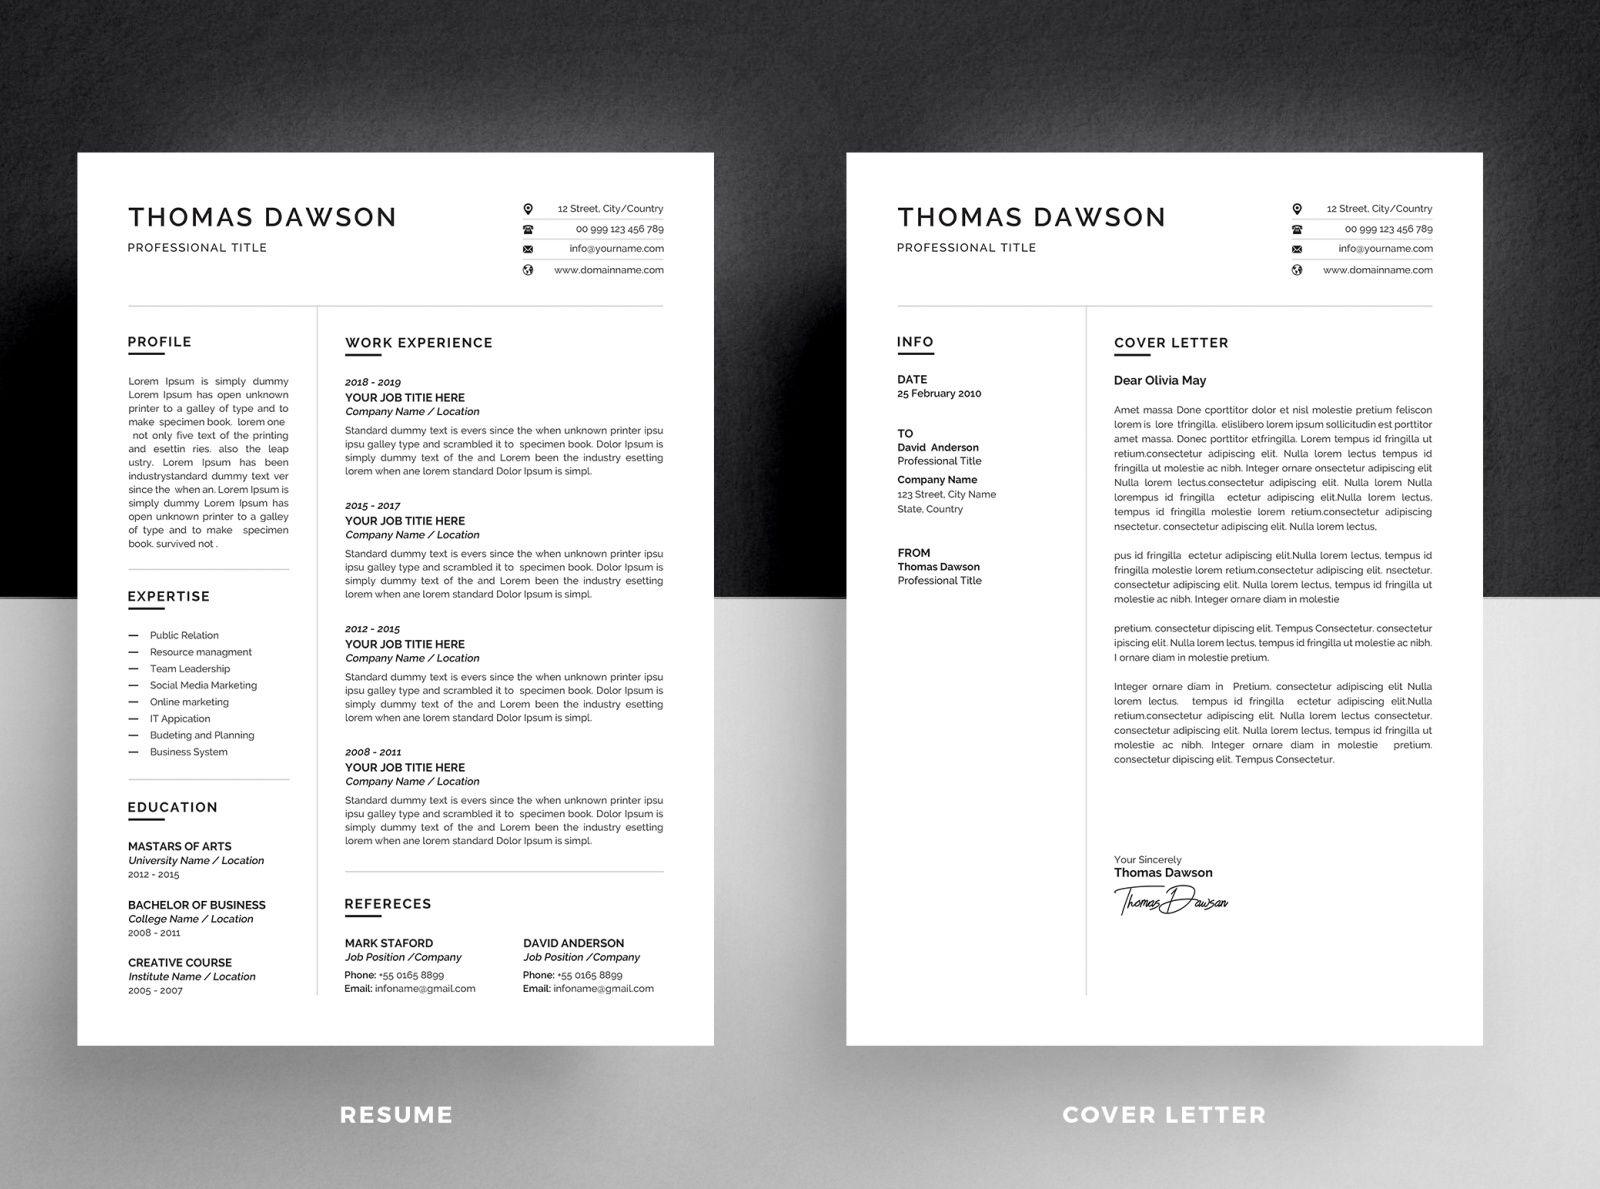 Resume Cv Cover Letter In 2020 Cv Cover Letter Resume Cv Unique Resume Template